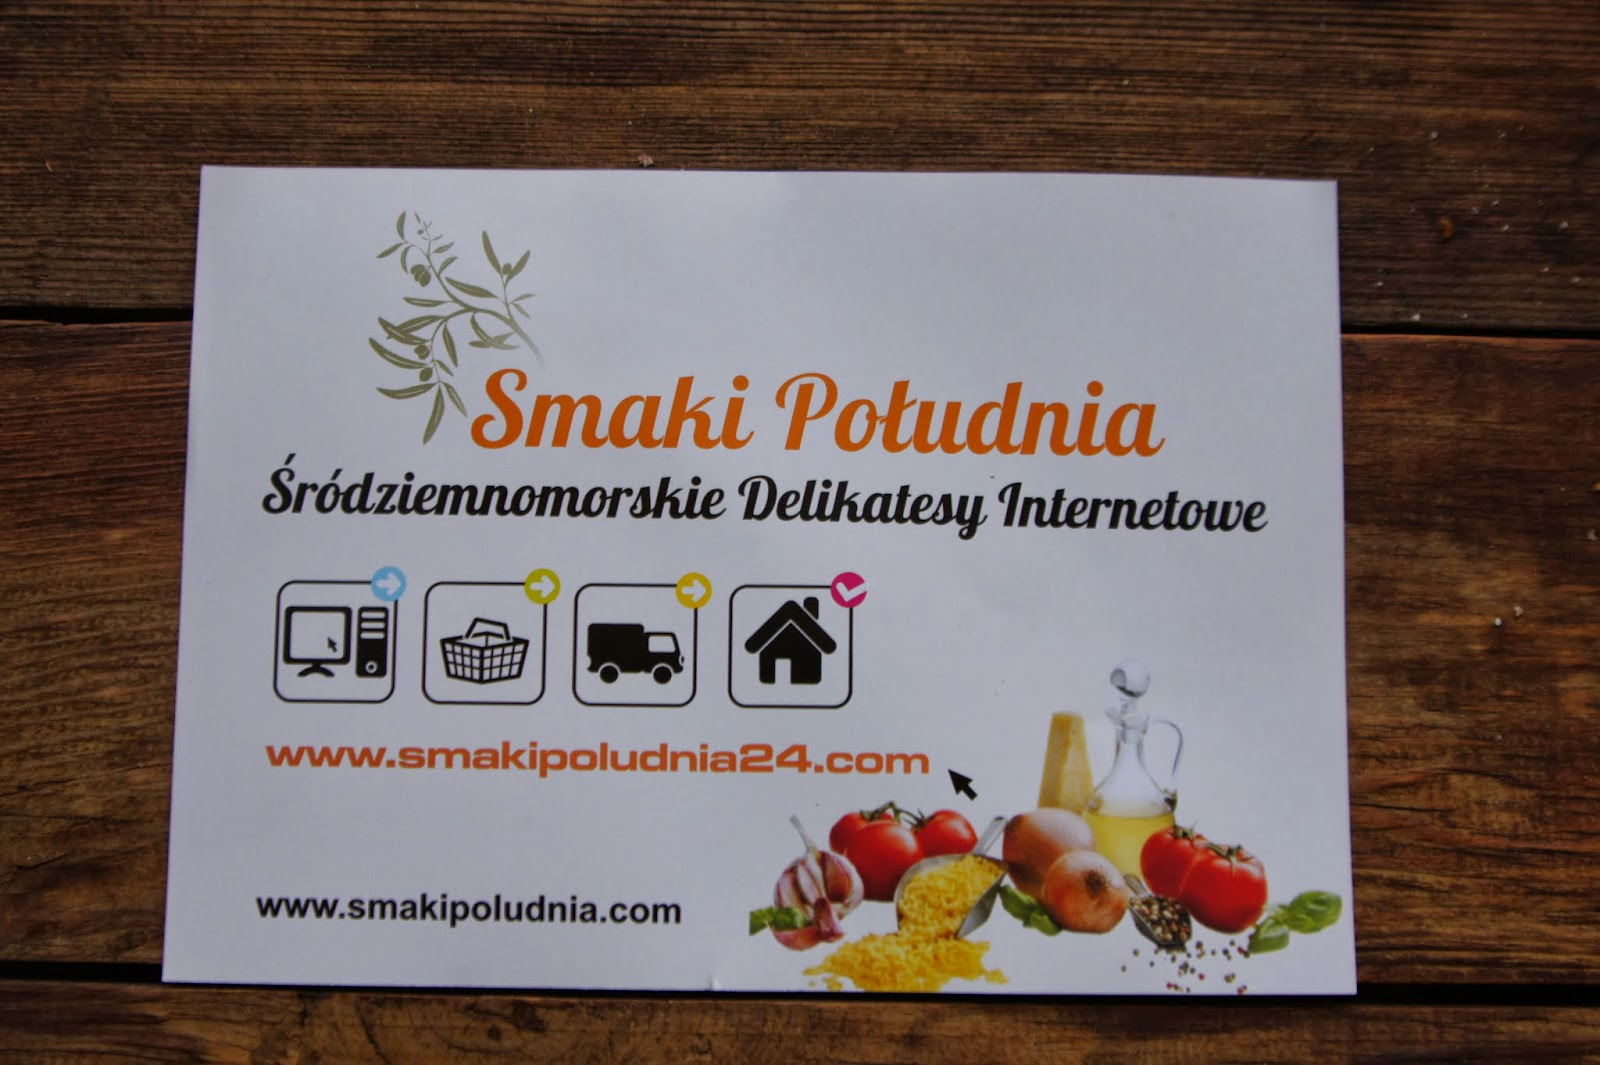 http://smakipoludnia24.pl/category/1/trufle-i-produkty-z-truflami.html